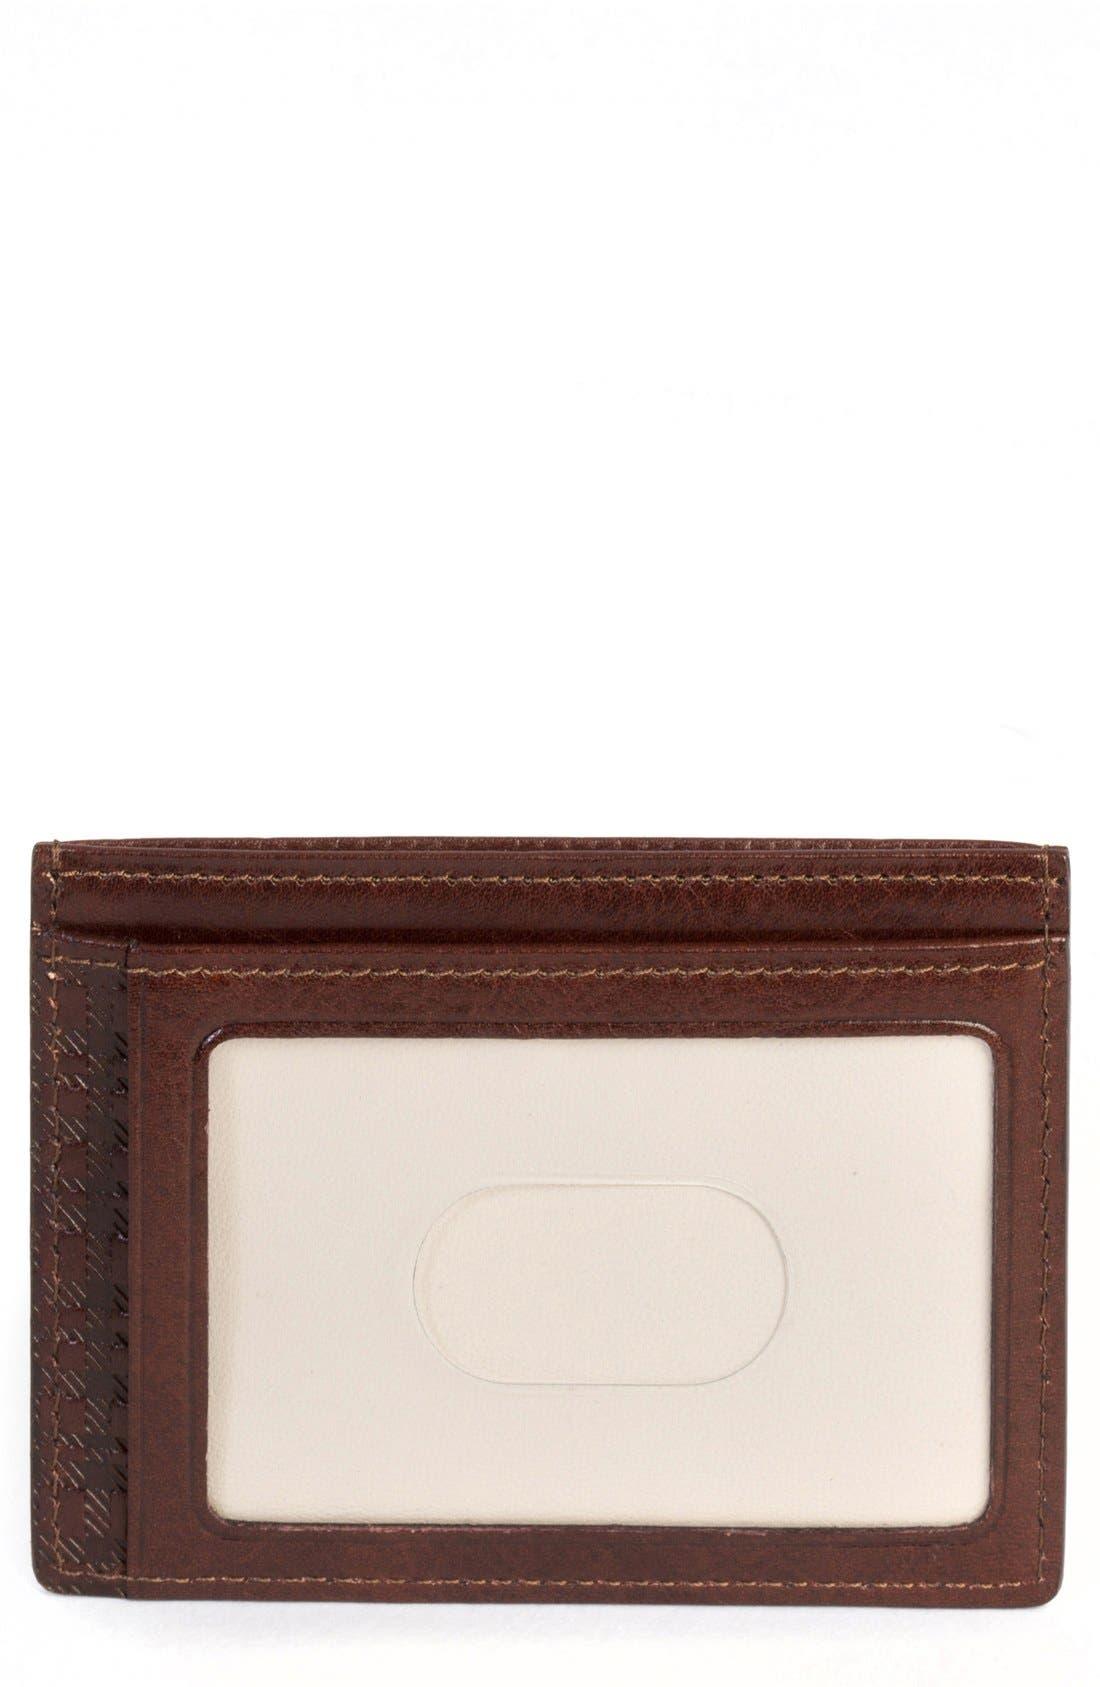 Boconi 'Becker' Leather Card Case